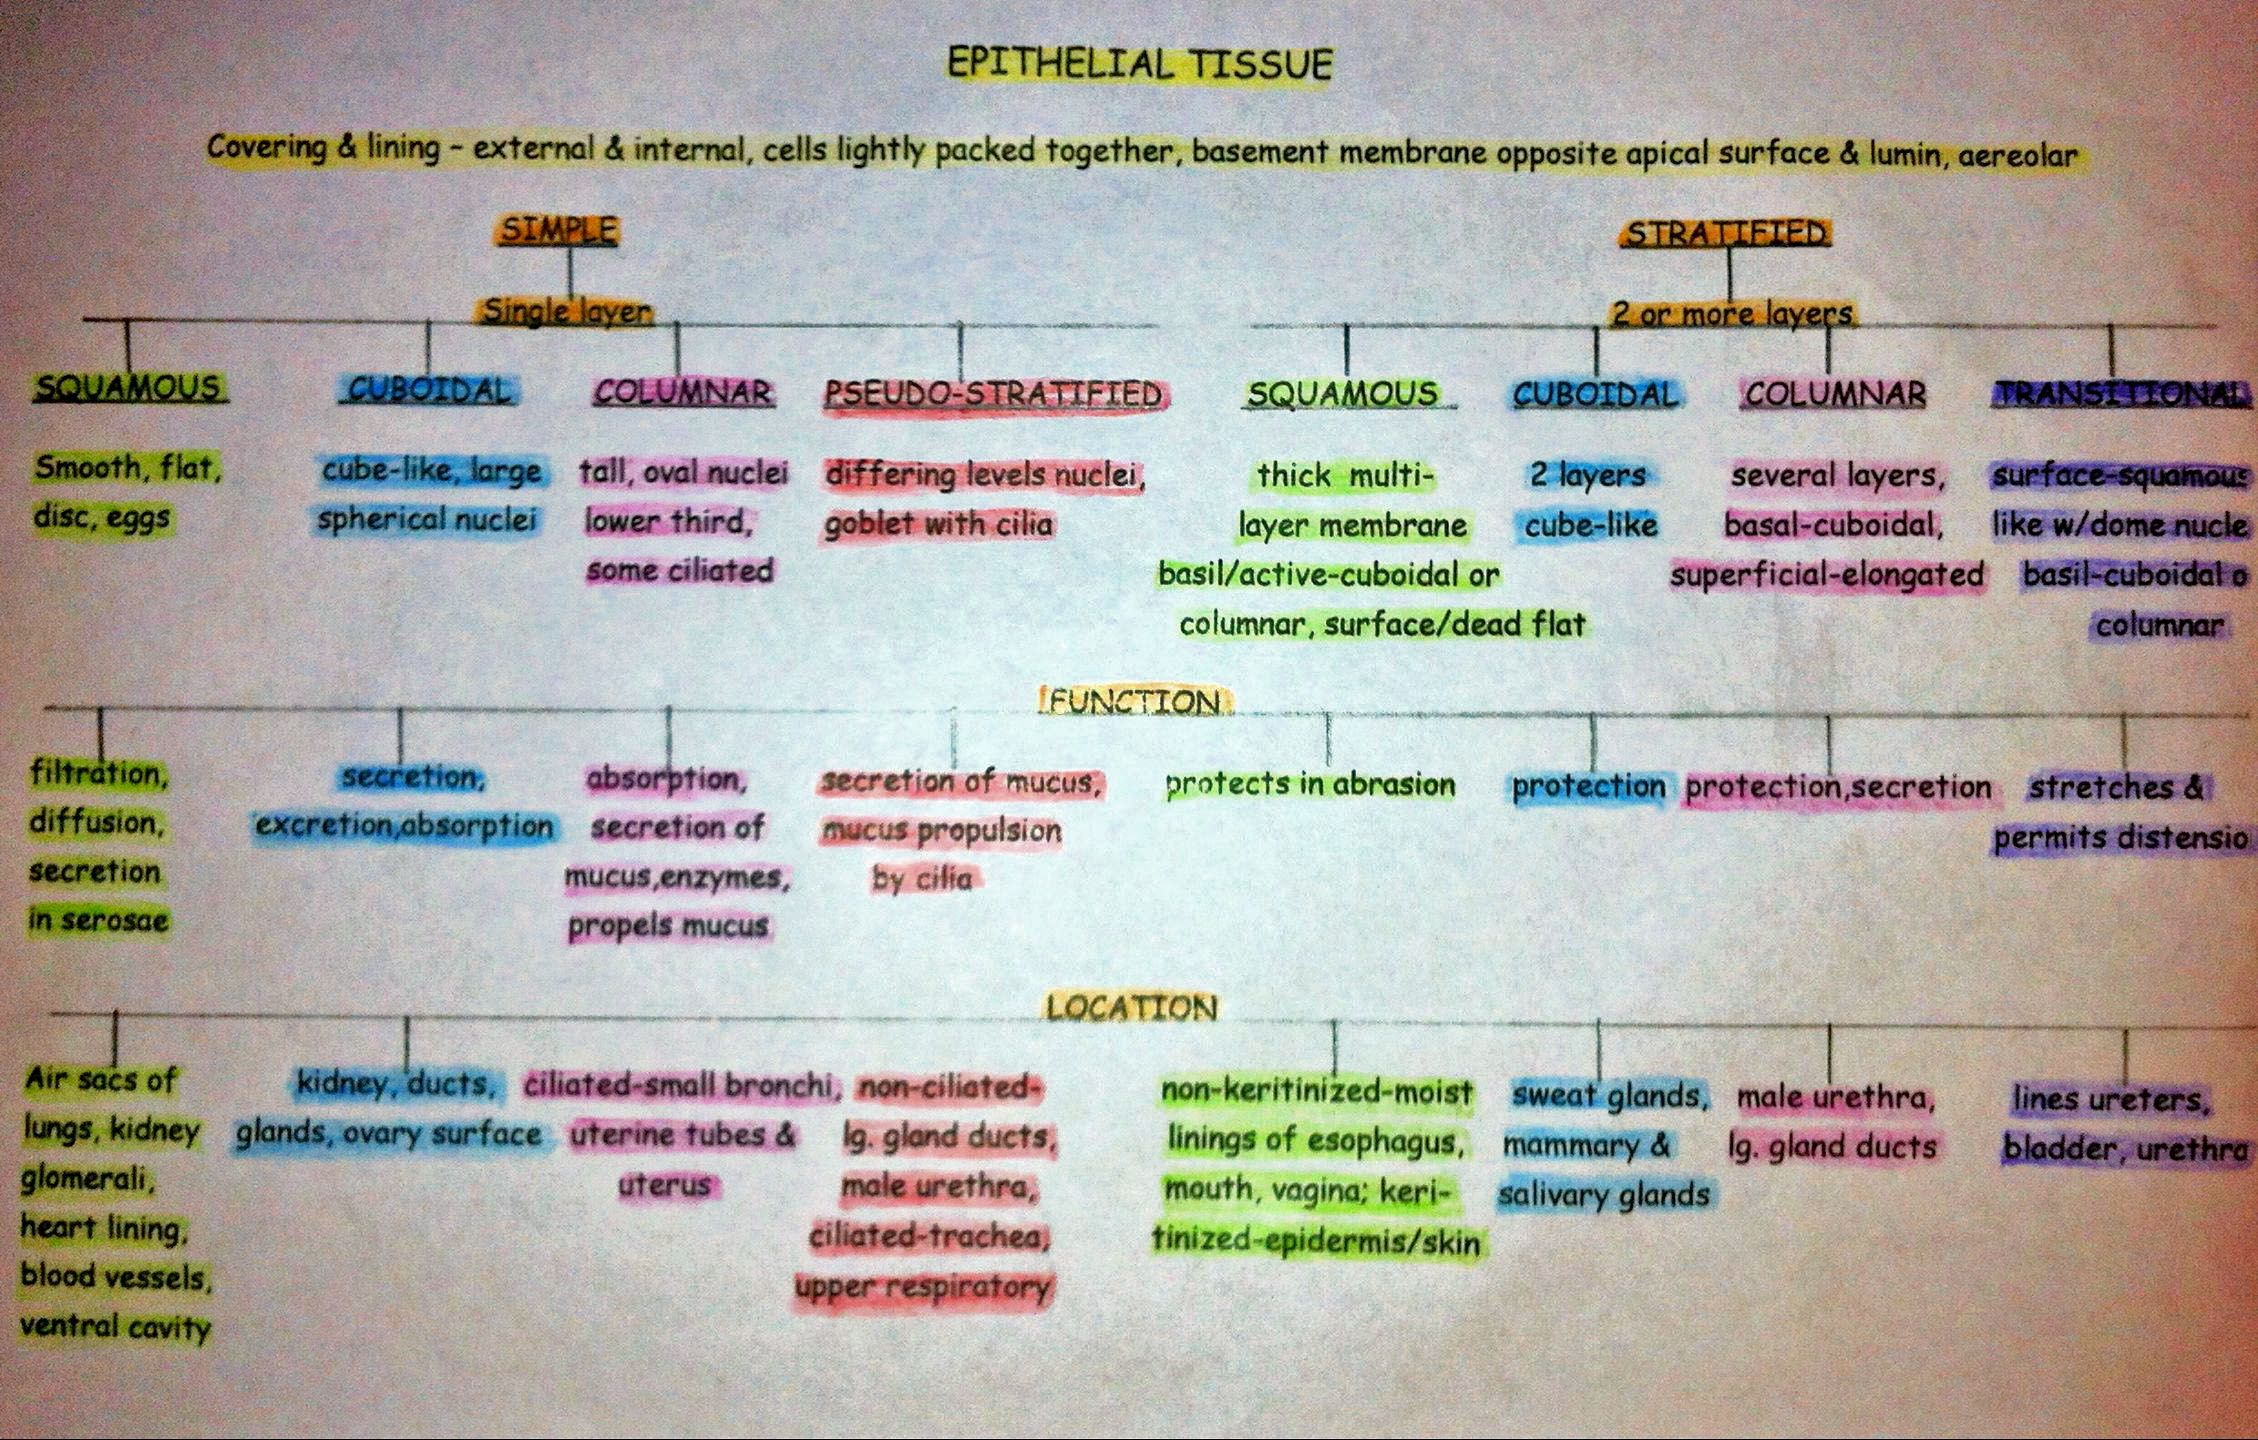 Epithelial Tissue Breakdown | Anatomy & Physiology | Pinterest ...